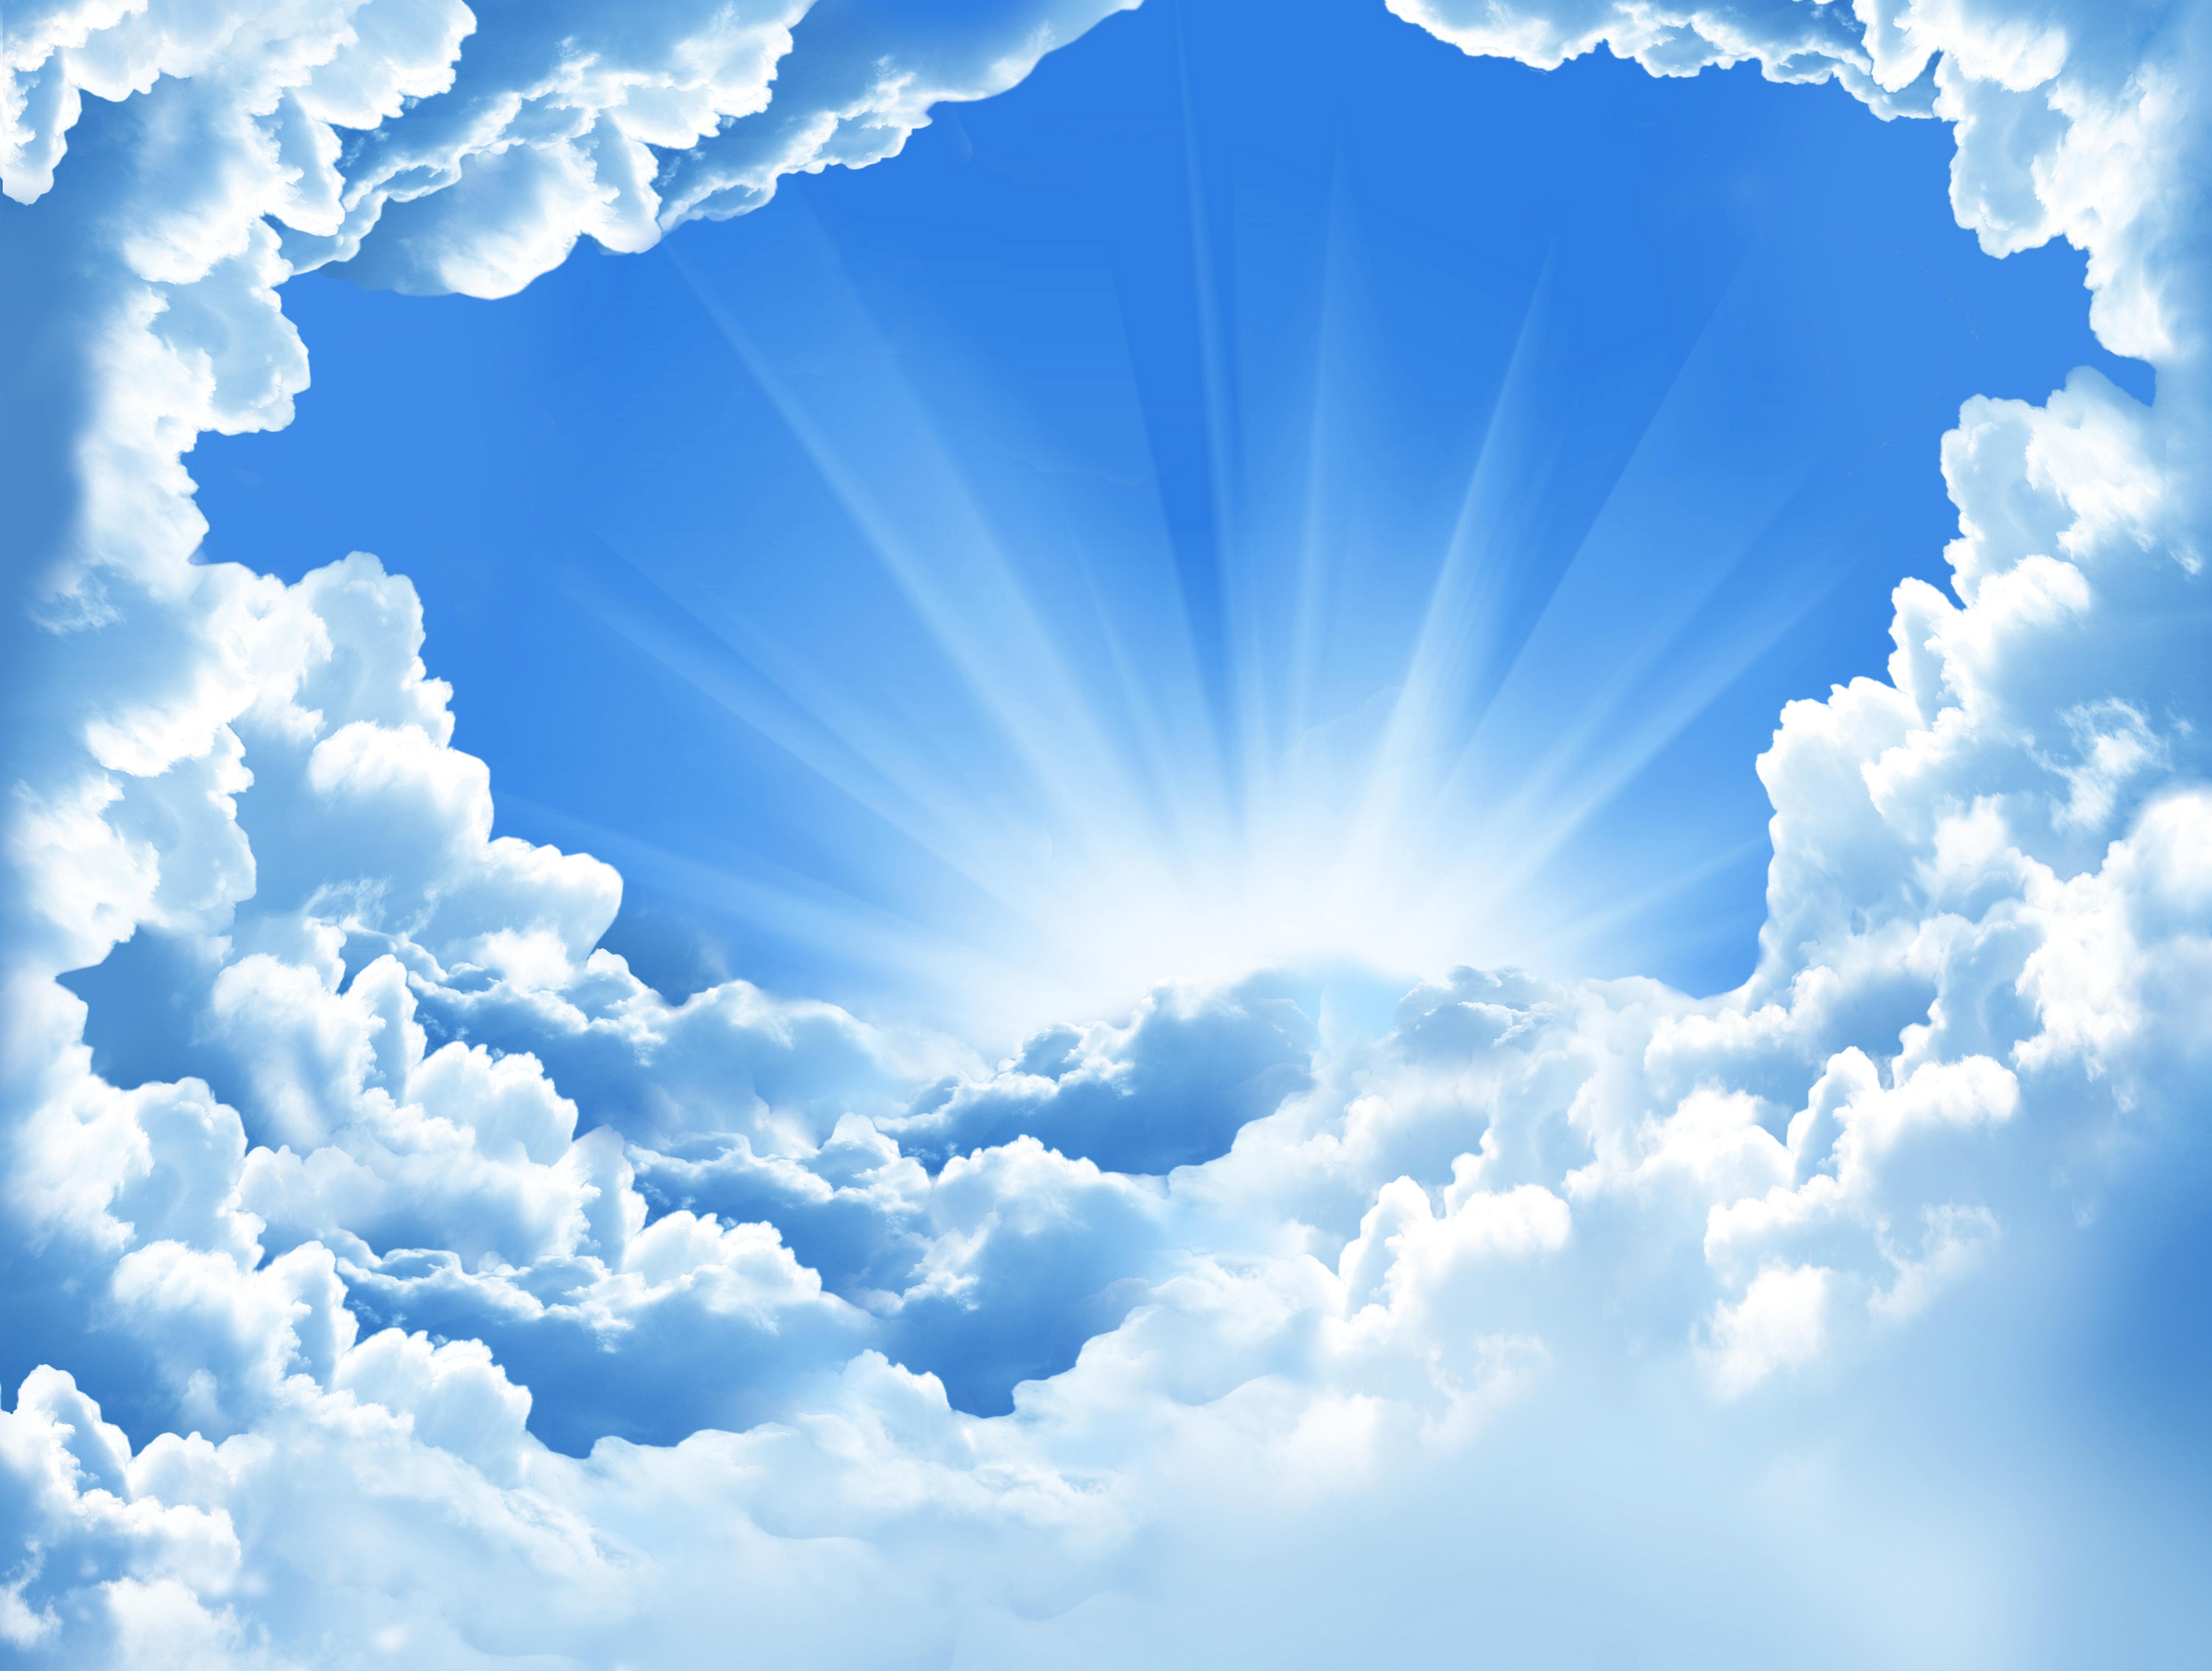 картинки красивого голубого неба мог, развернув машину